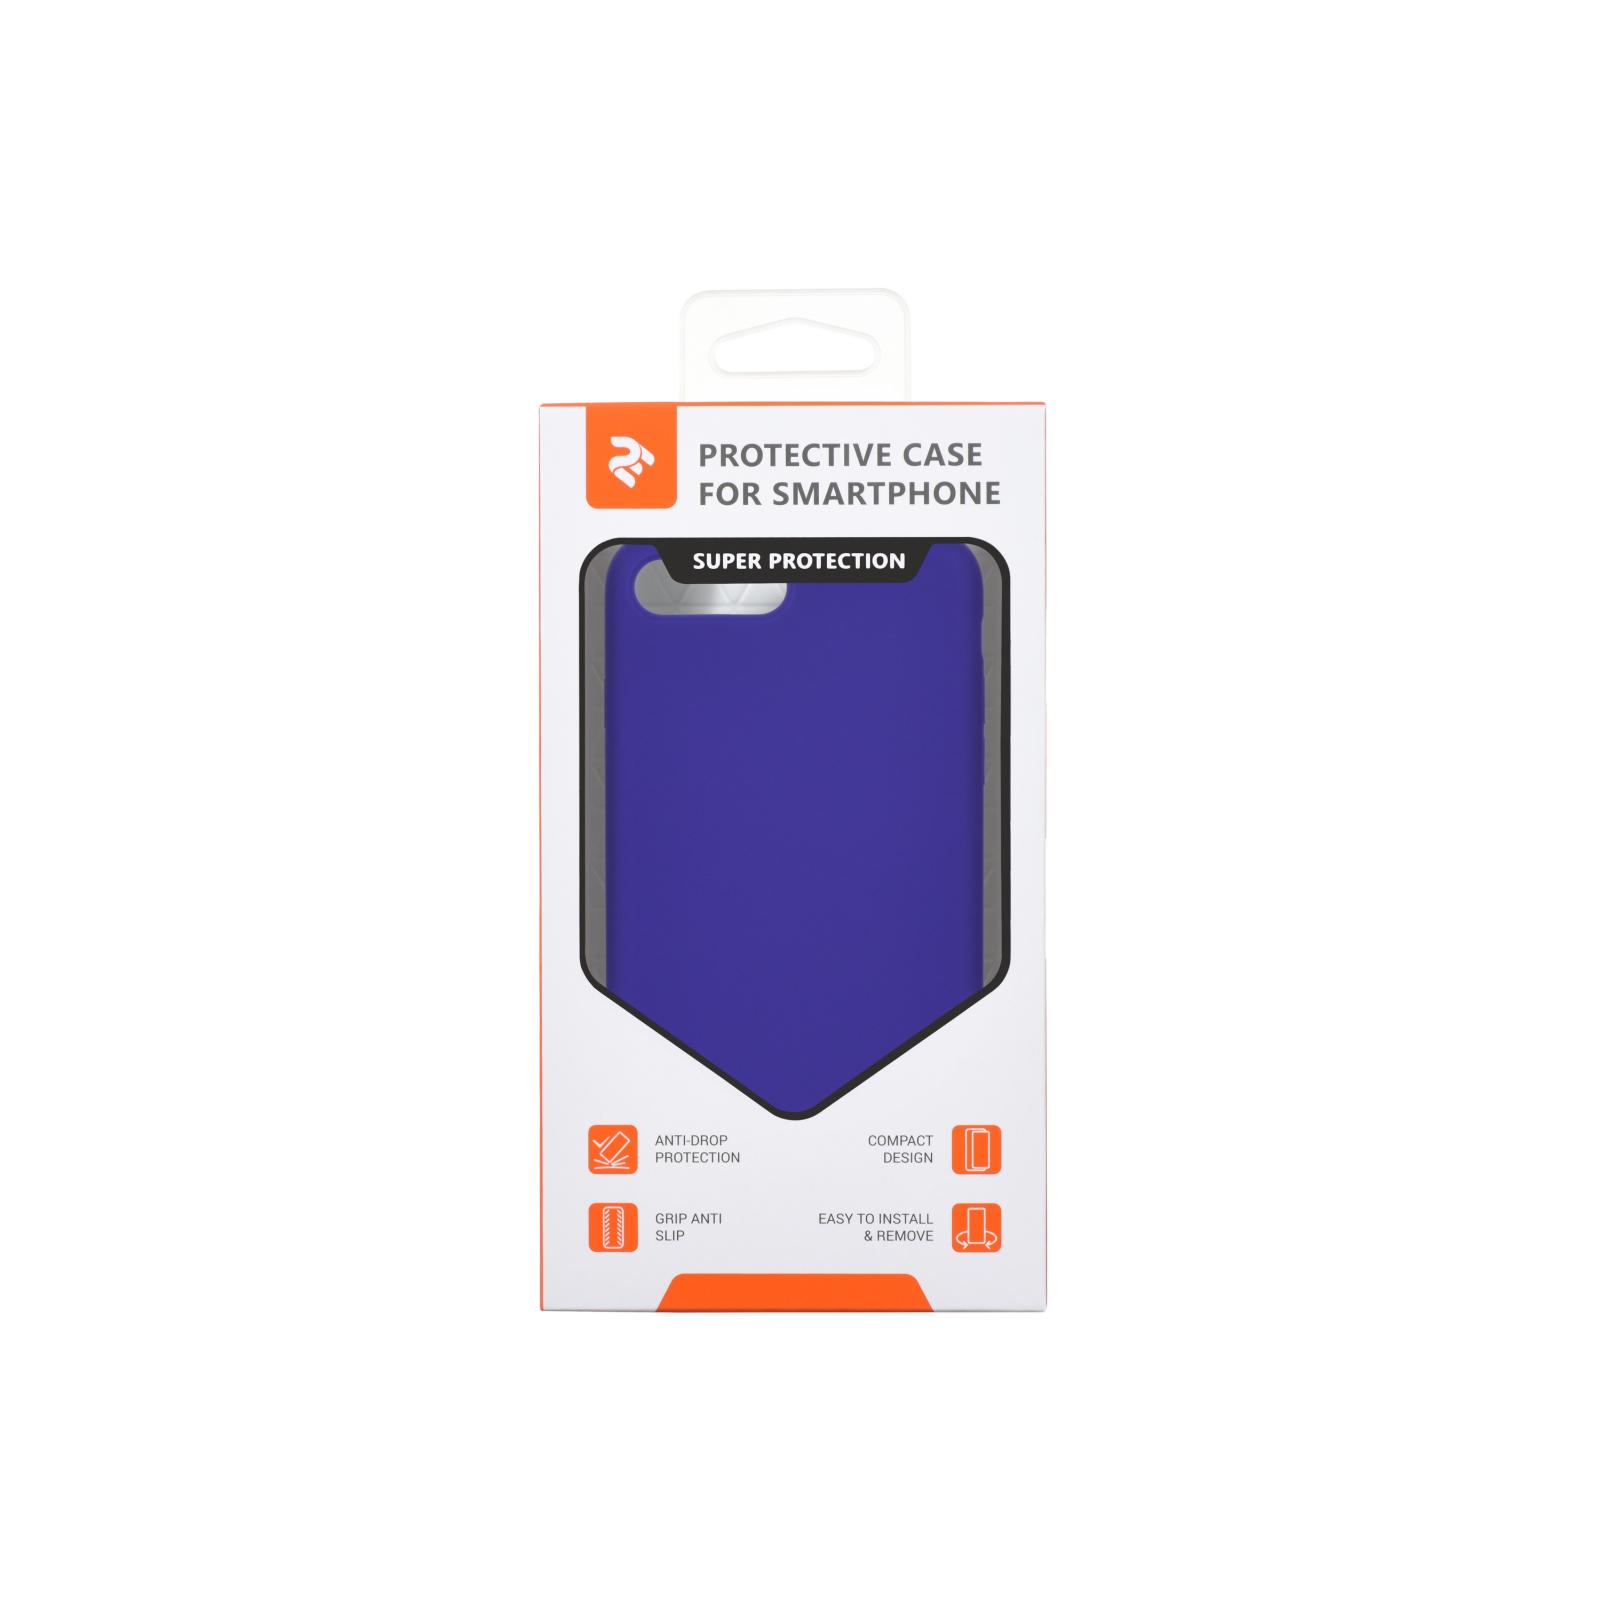 Чохол до моб. телефона 2E Apple iPhone 7/8 Plus, Liquid Silicone, Light Purple (2E-IPH-7/8P-NKSLS-LP) зображення 3